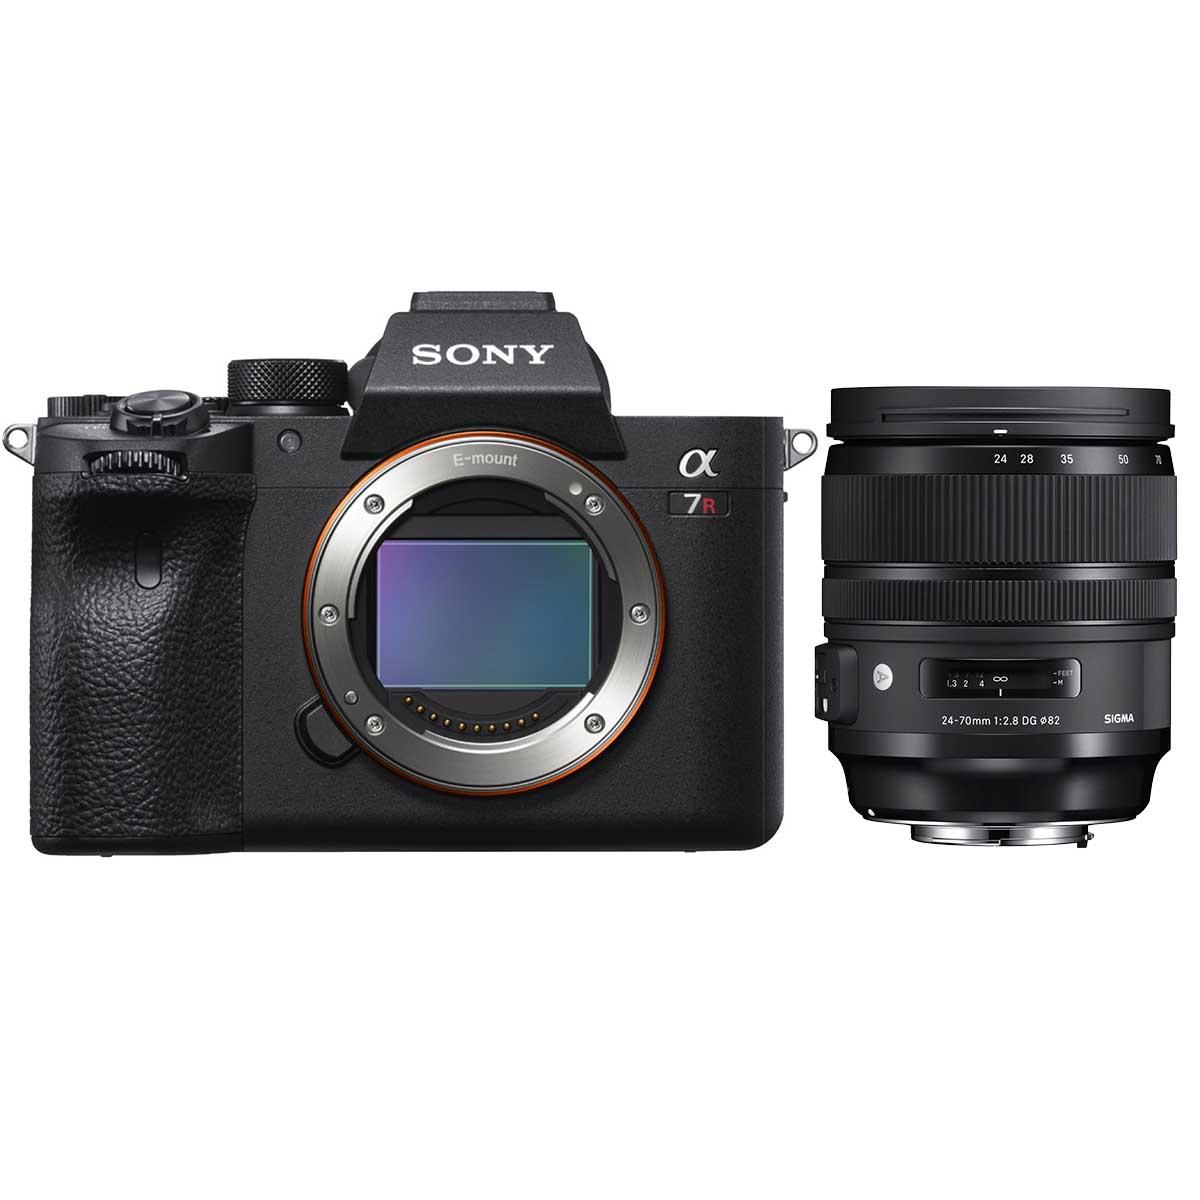 Sony Alpha 7R III Body + Sigma 24-70 mm F2,8 DG DN ART Objektiv (exkl. 500€ Cashback = 2799€)